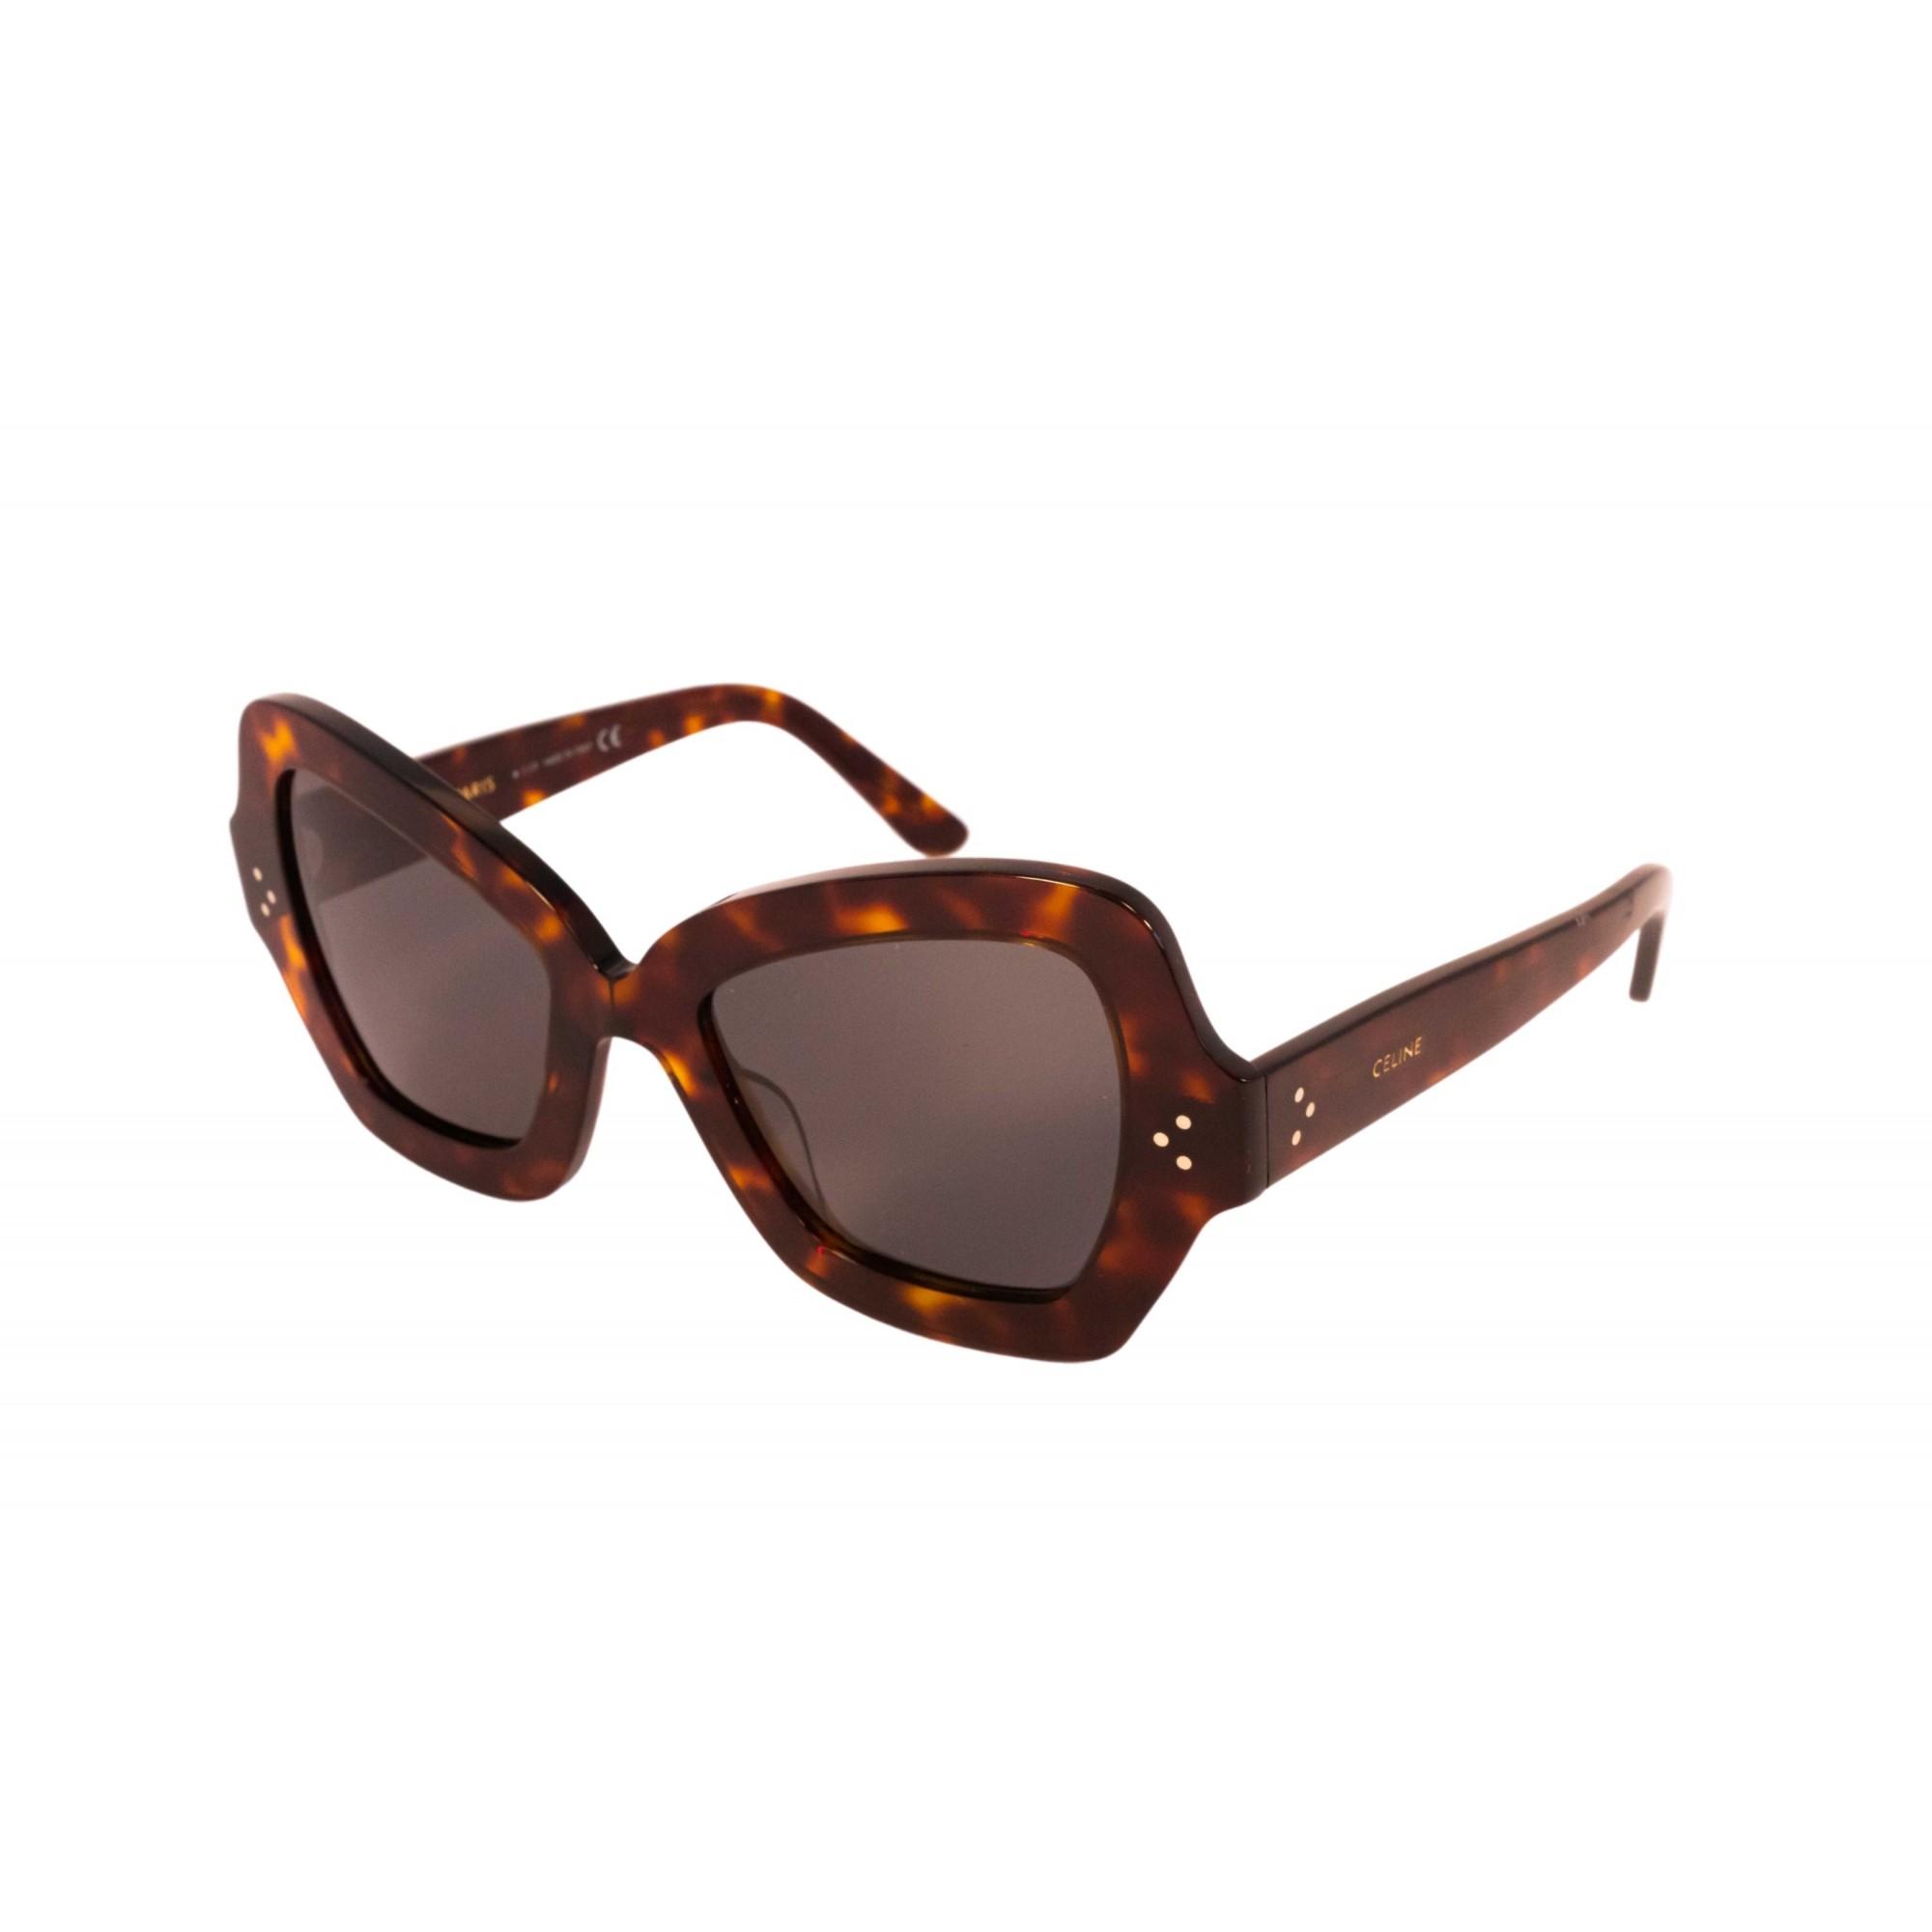 Óculos Celine borboleta cl40067i 54a 54 Tartaruga